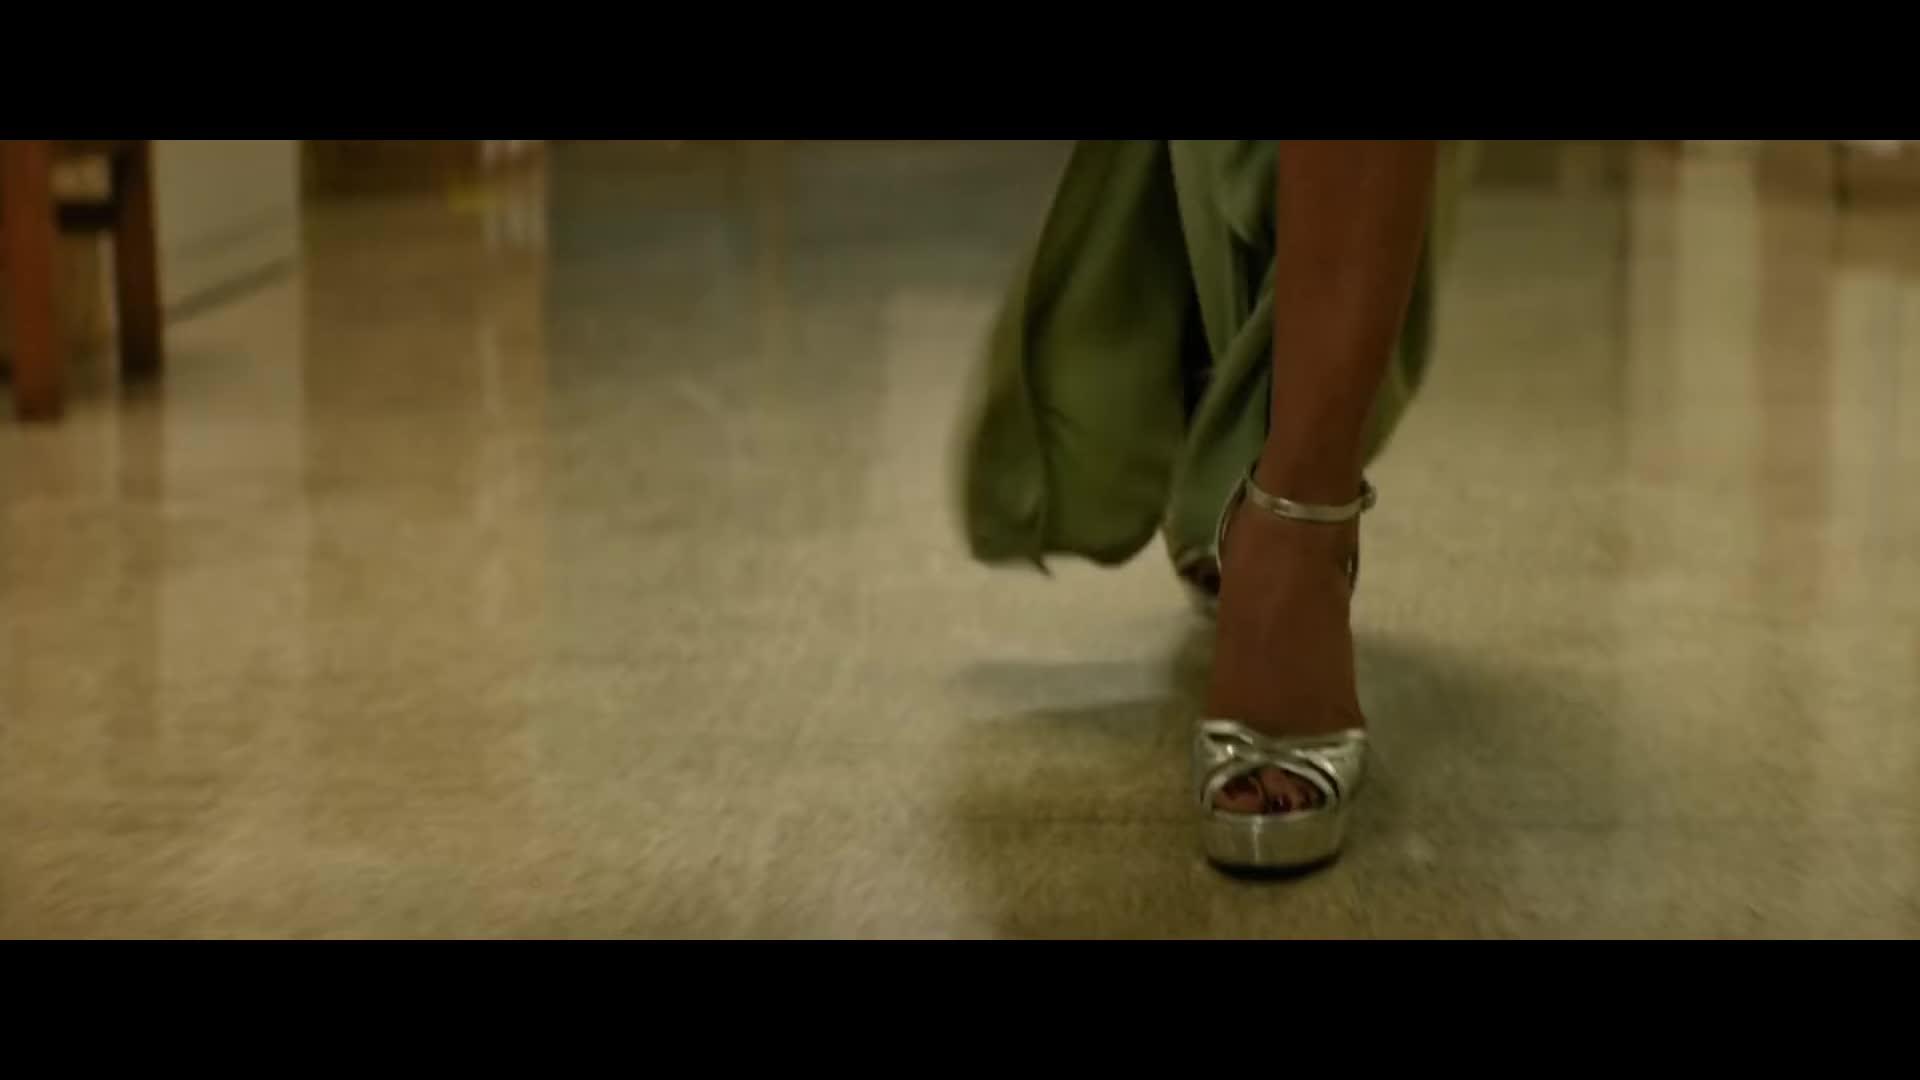 baywatch, chopra, dress, film, hot, movie, priyanka, priyanka chopra, Baywatch   Priyanka Chopra GIFs